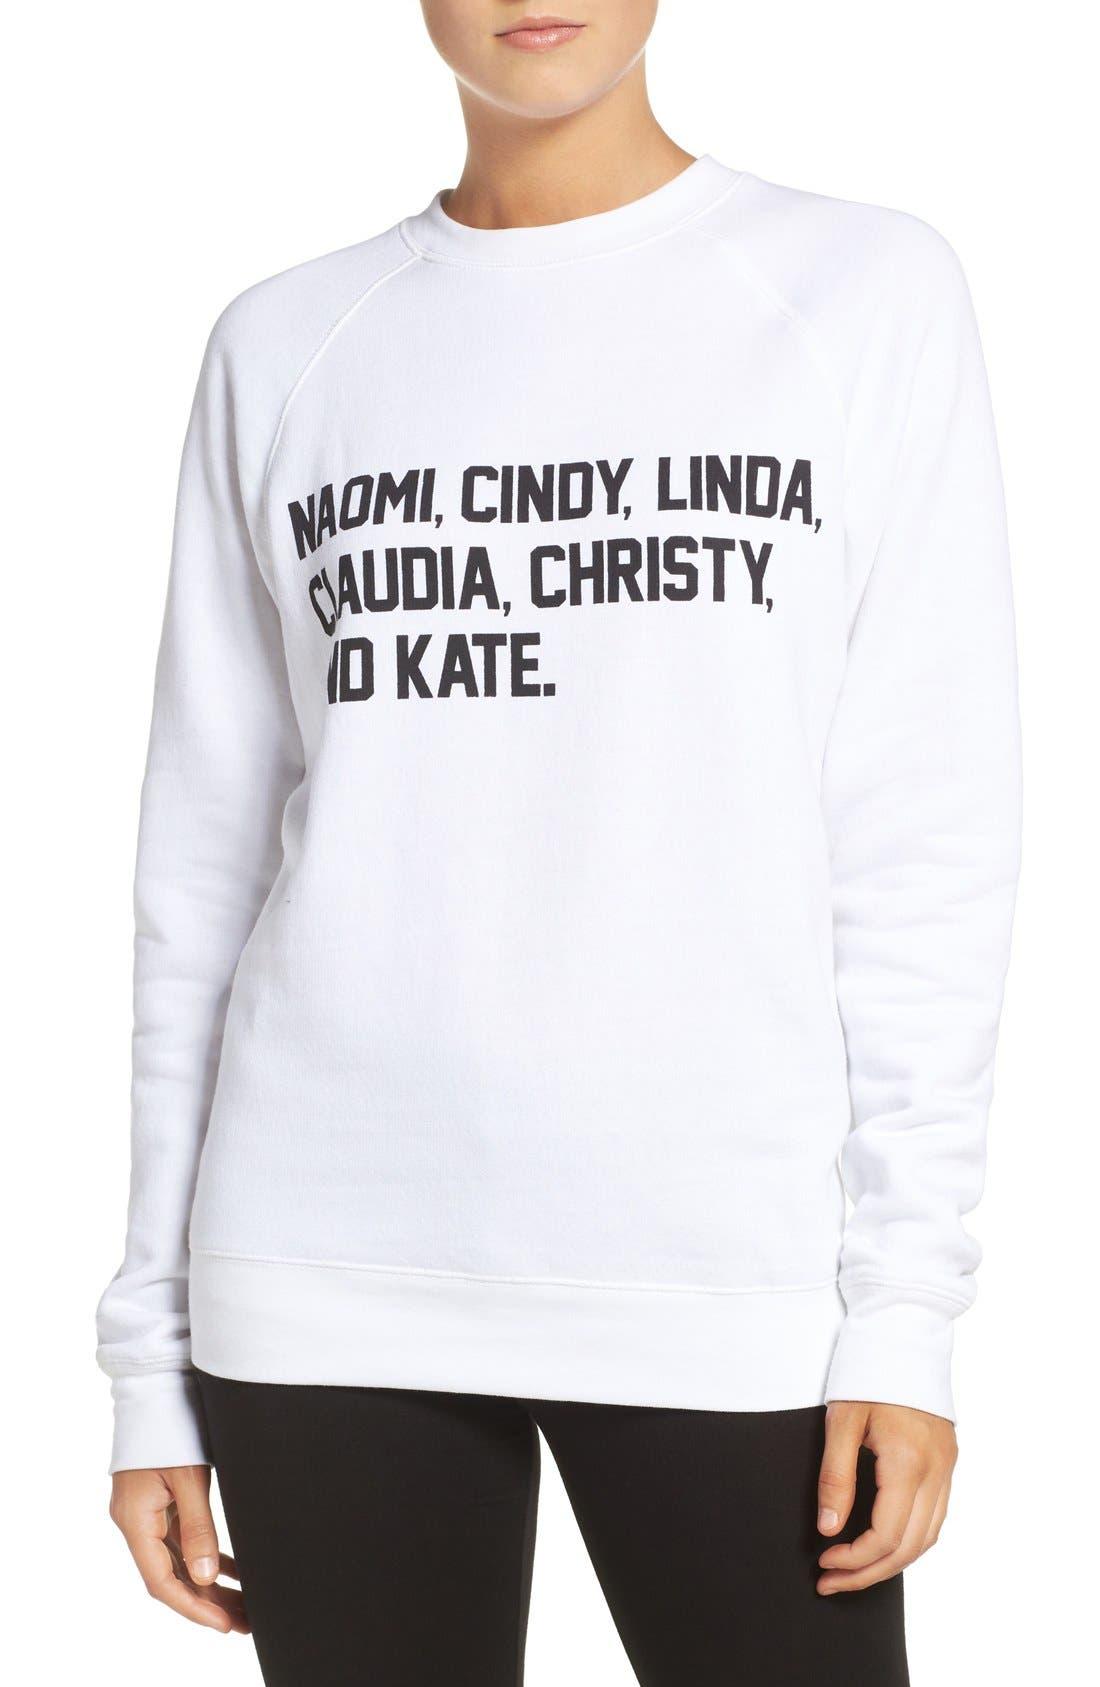 BRUNETTE THE LABEL Brunette 'Roll Call' Crewneck Sweatshirt, Main, color, 100